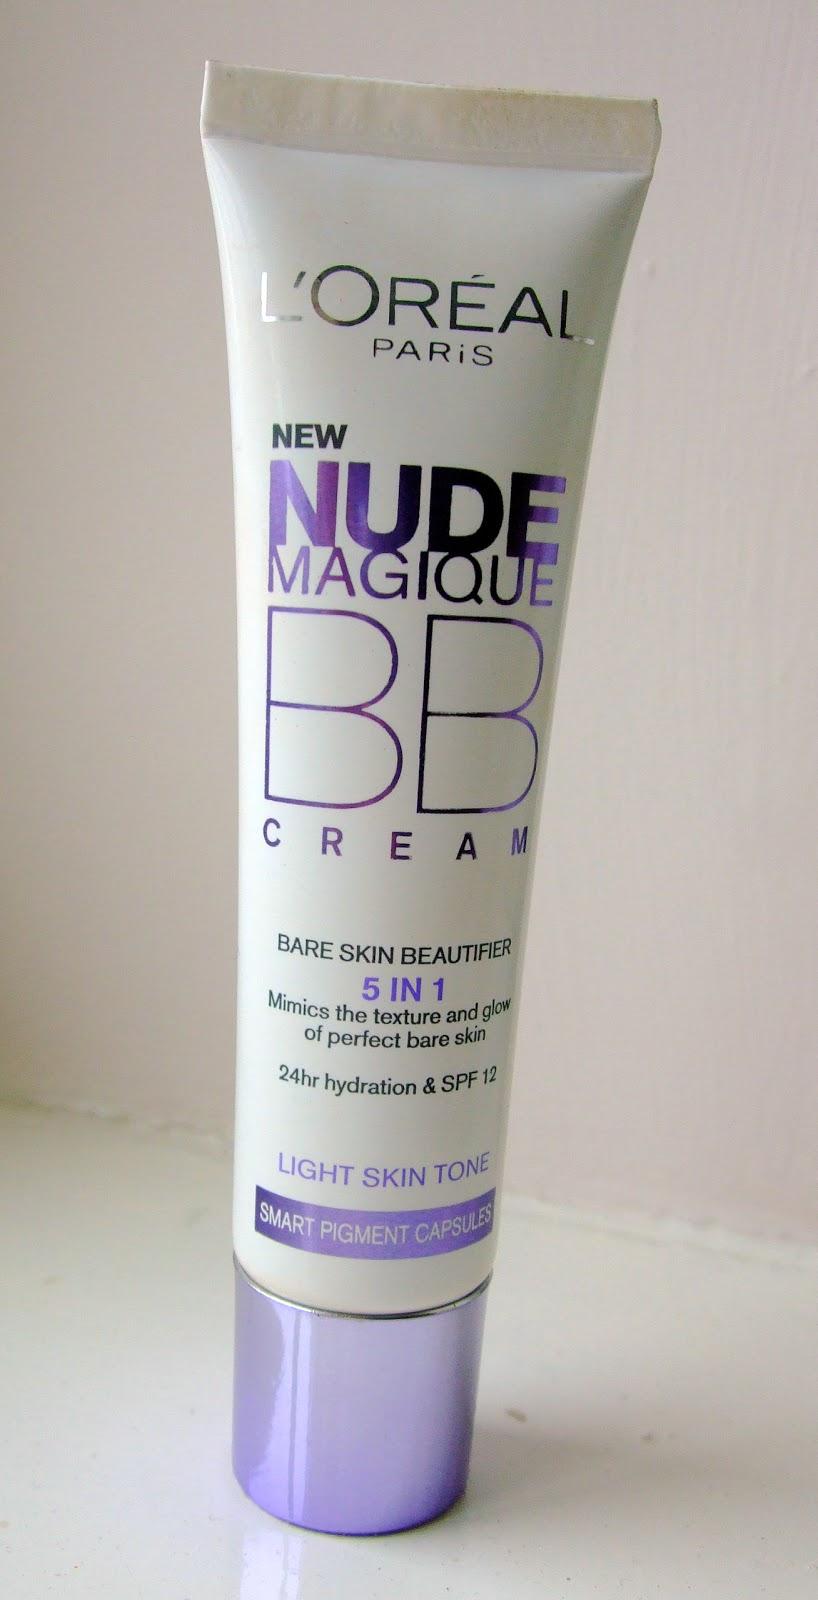 Jade-Emma: L'Oreal Nude Magique BB Cream